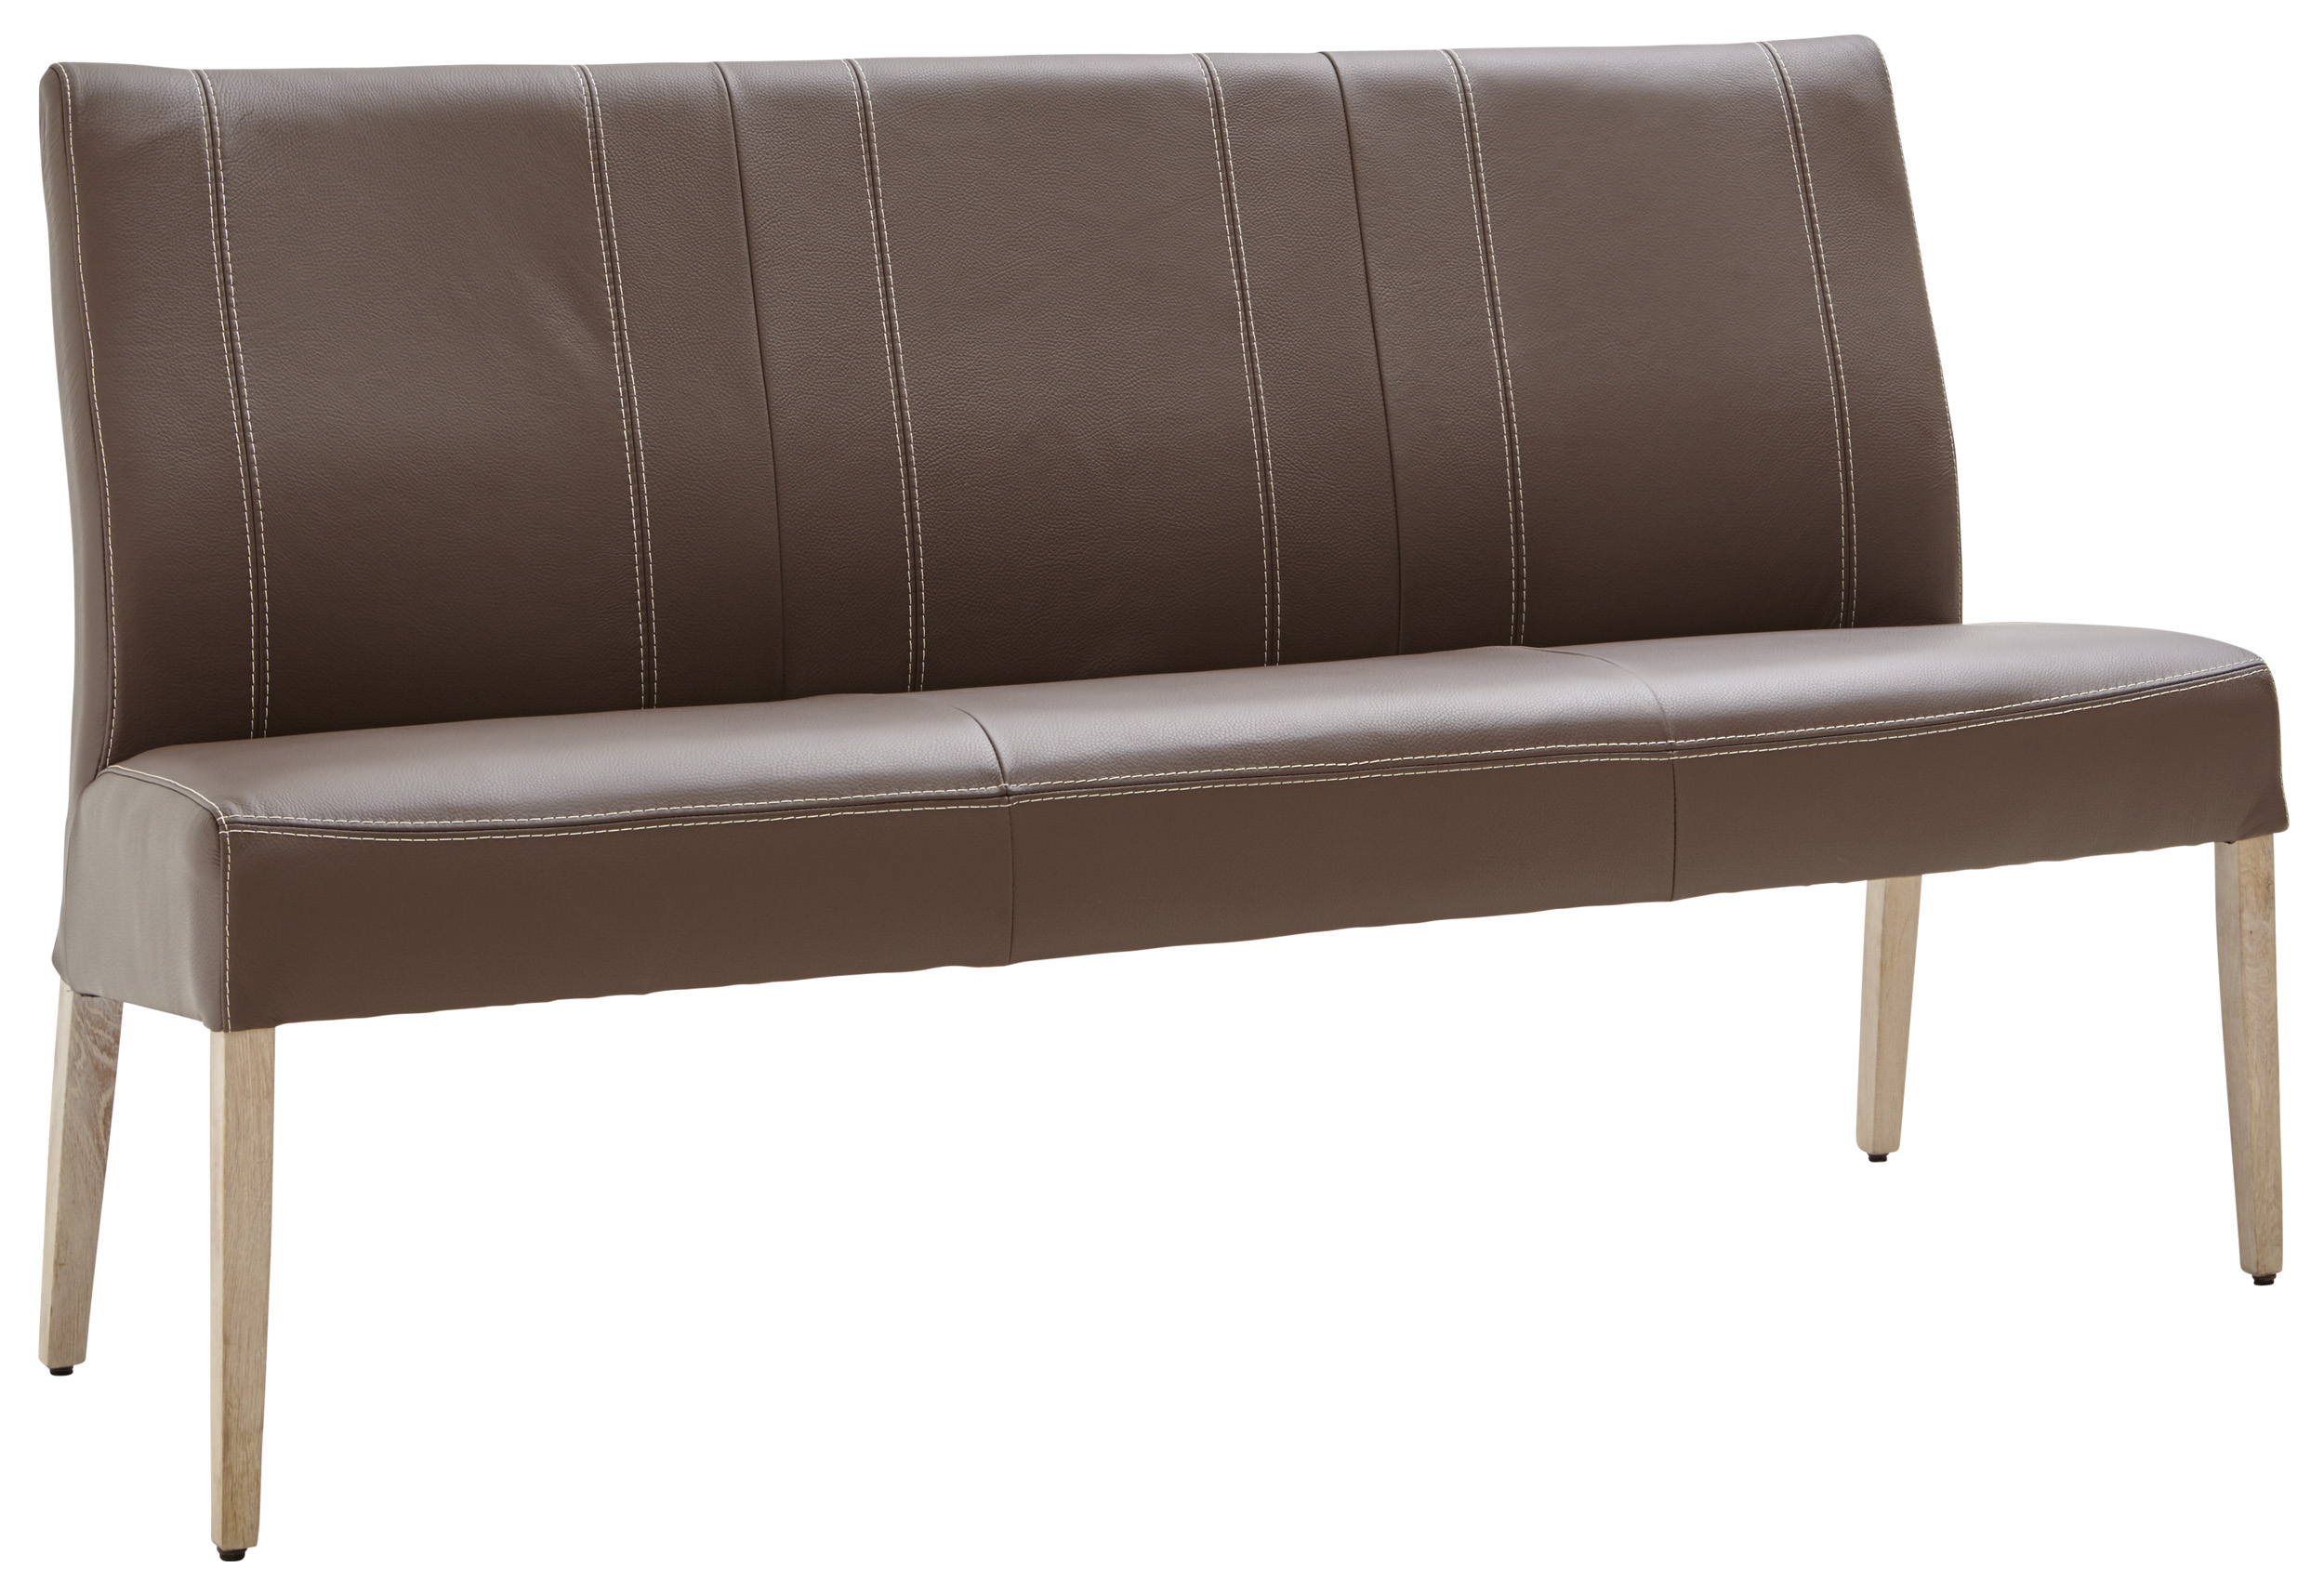 espresso farbene lederbank mit f en in eiche bianco natura utah m belhaus pohl. Black Bedroom Furniture Sets. Home Design Ideas